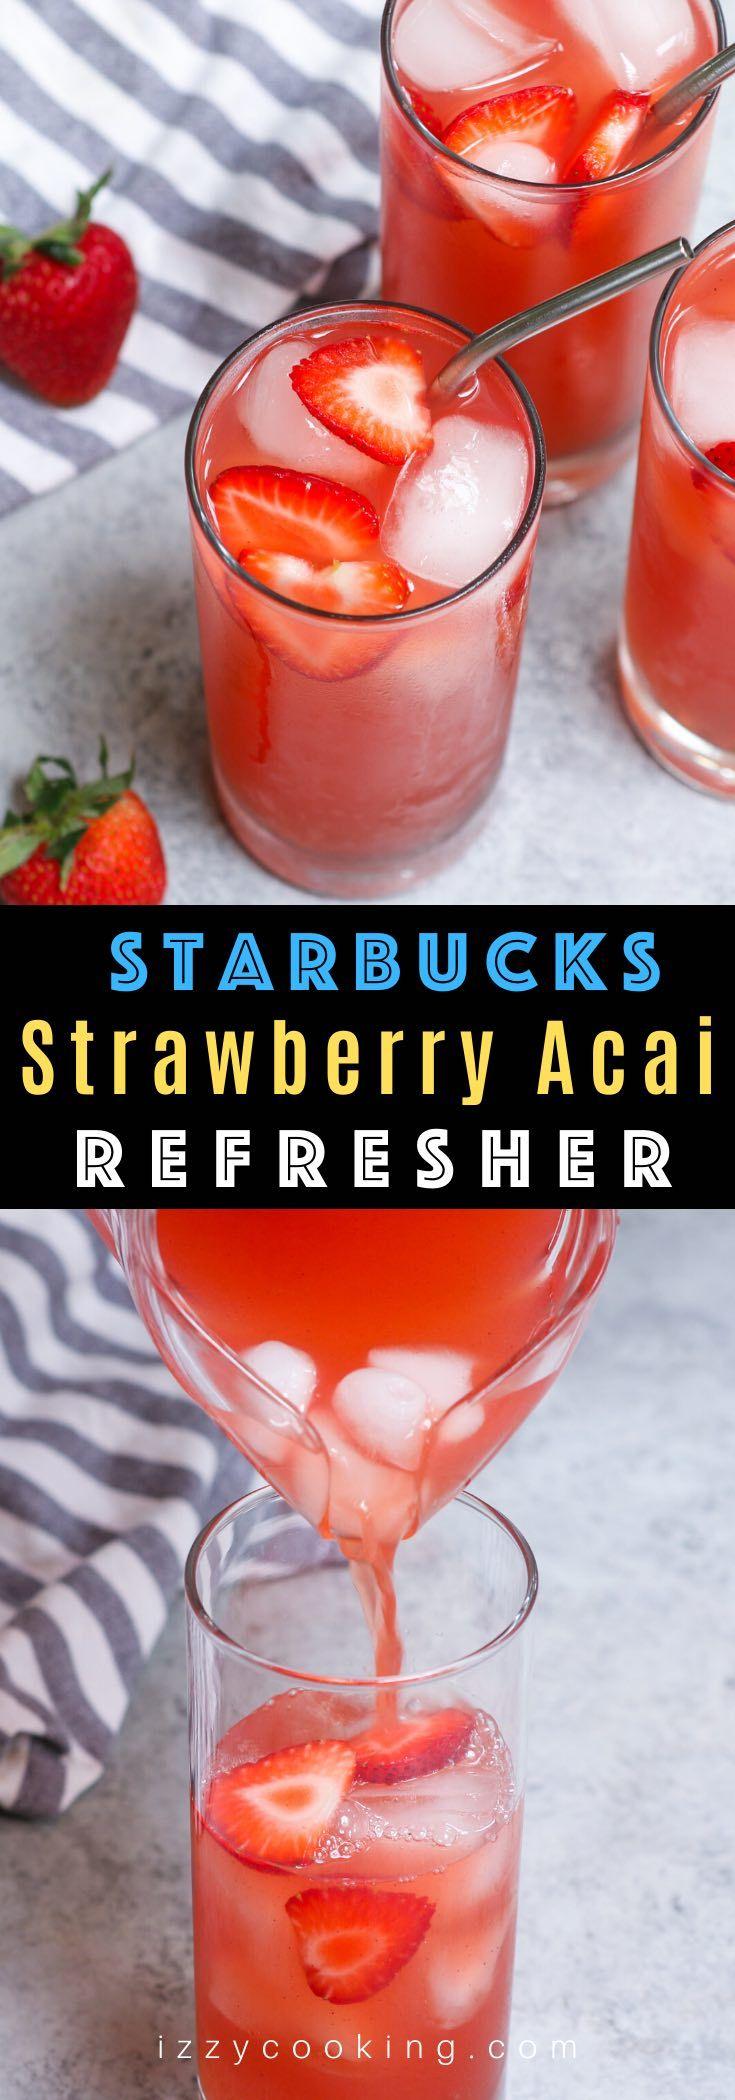 Strawberry Acai Refresher   Recipe in 2020   Strawberry ...